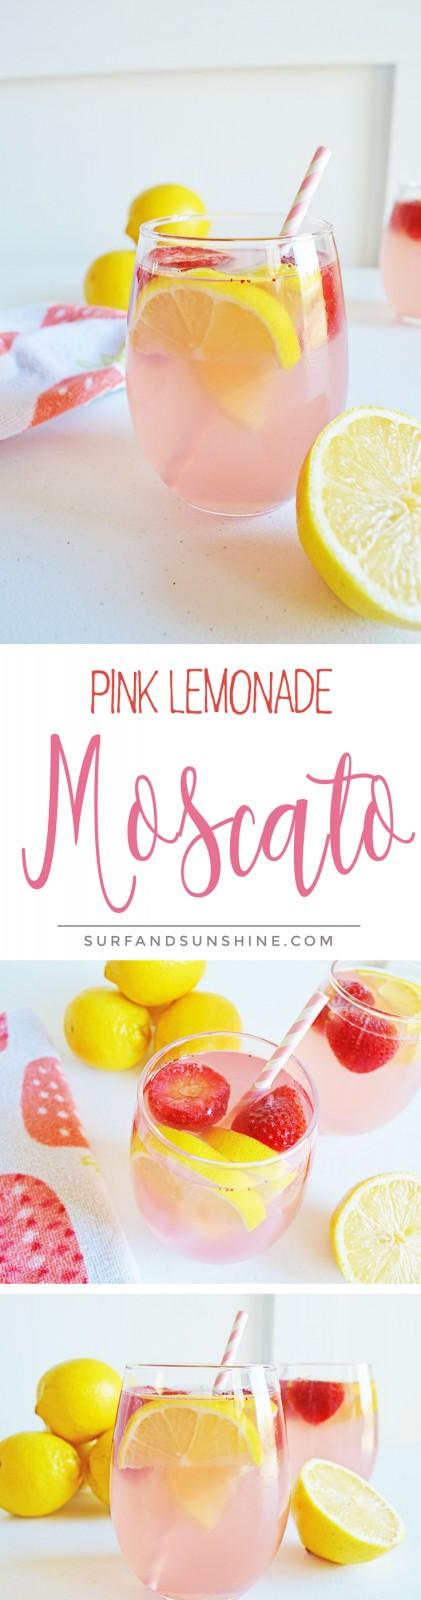 Pink Lemonade Moscato Recipe